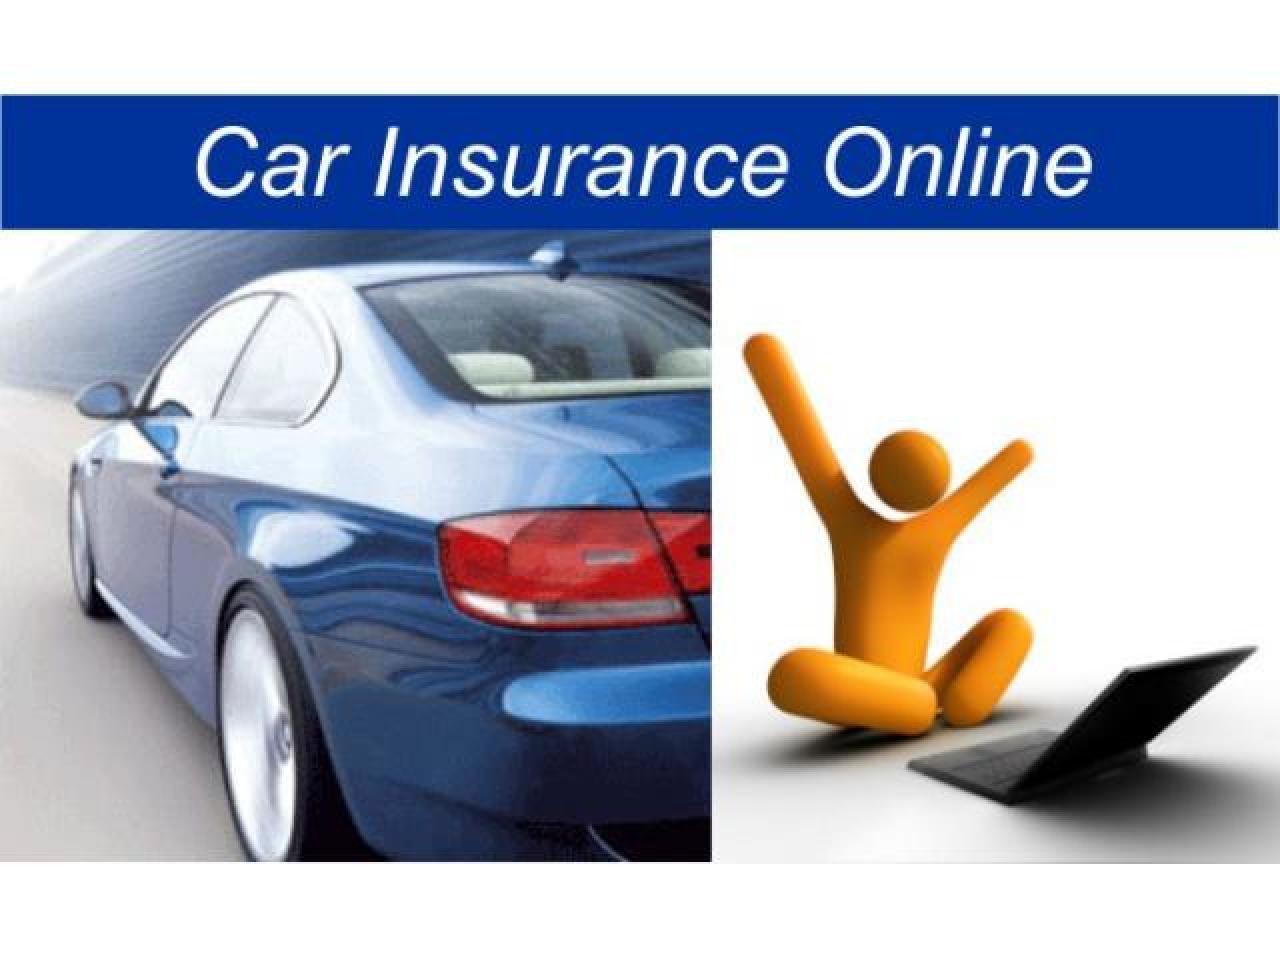 Car insurance, авто страхование - 1